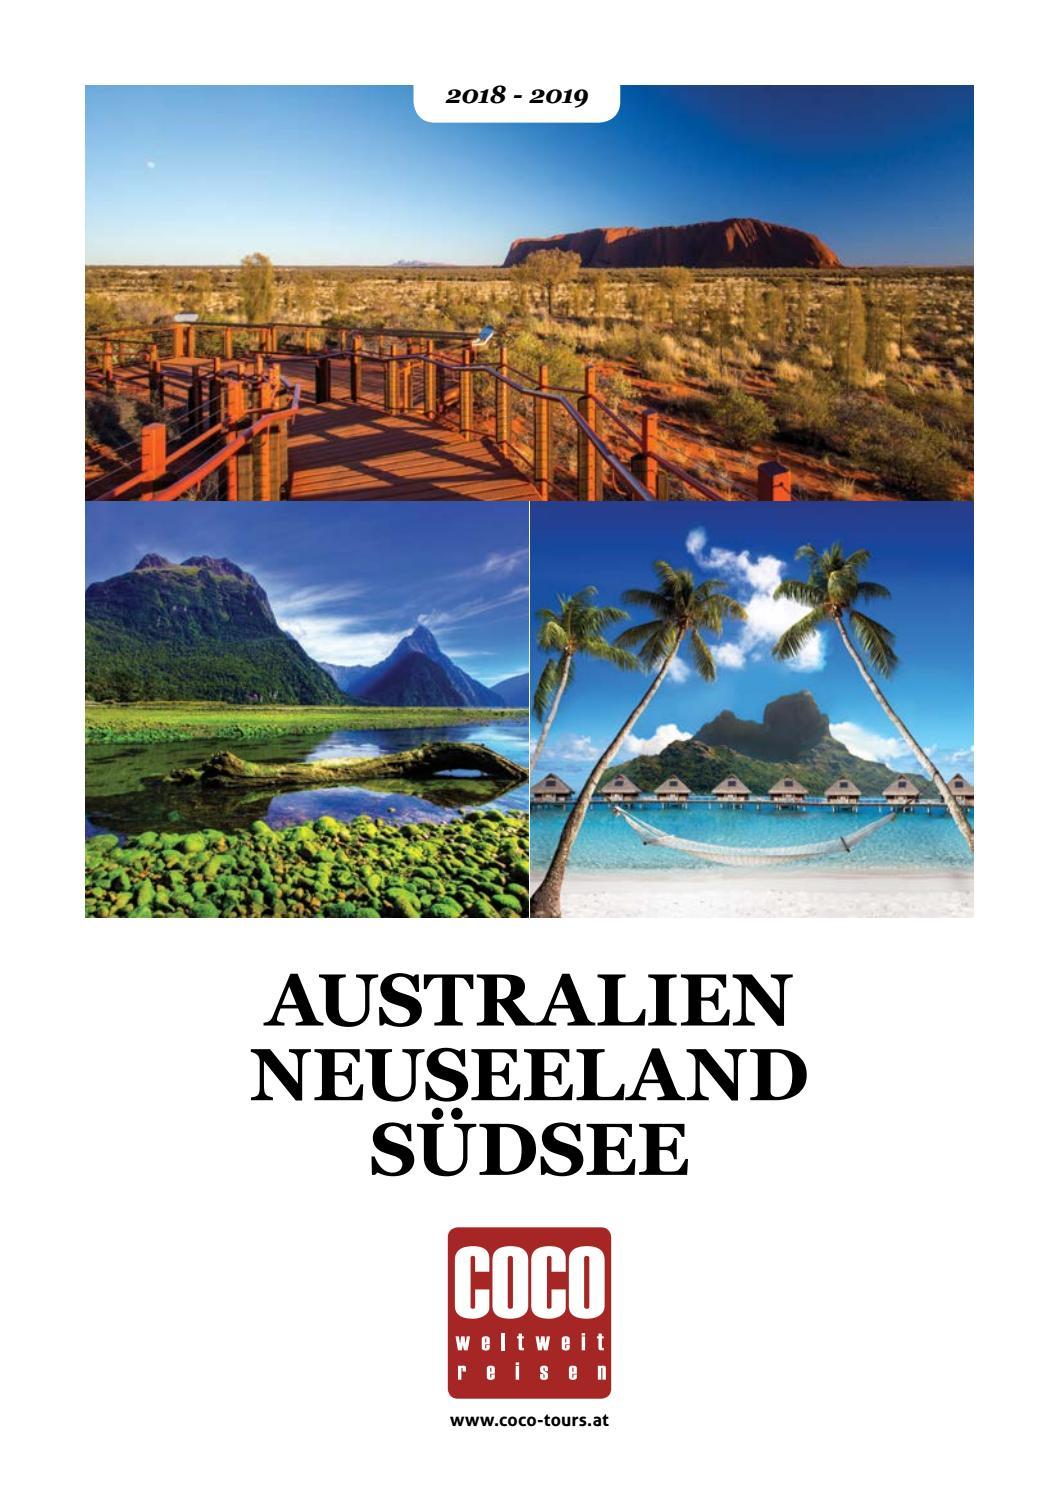 Destination AU/NZ COCO 2018-2019 by koolivoo - issuu